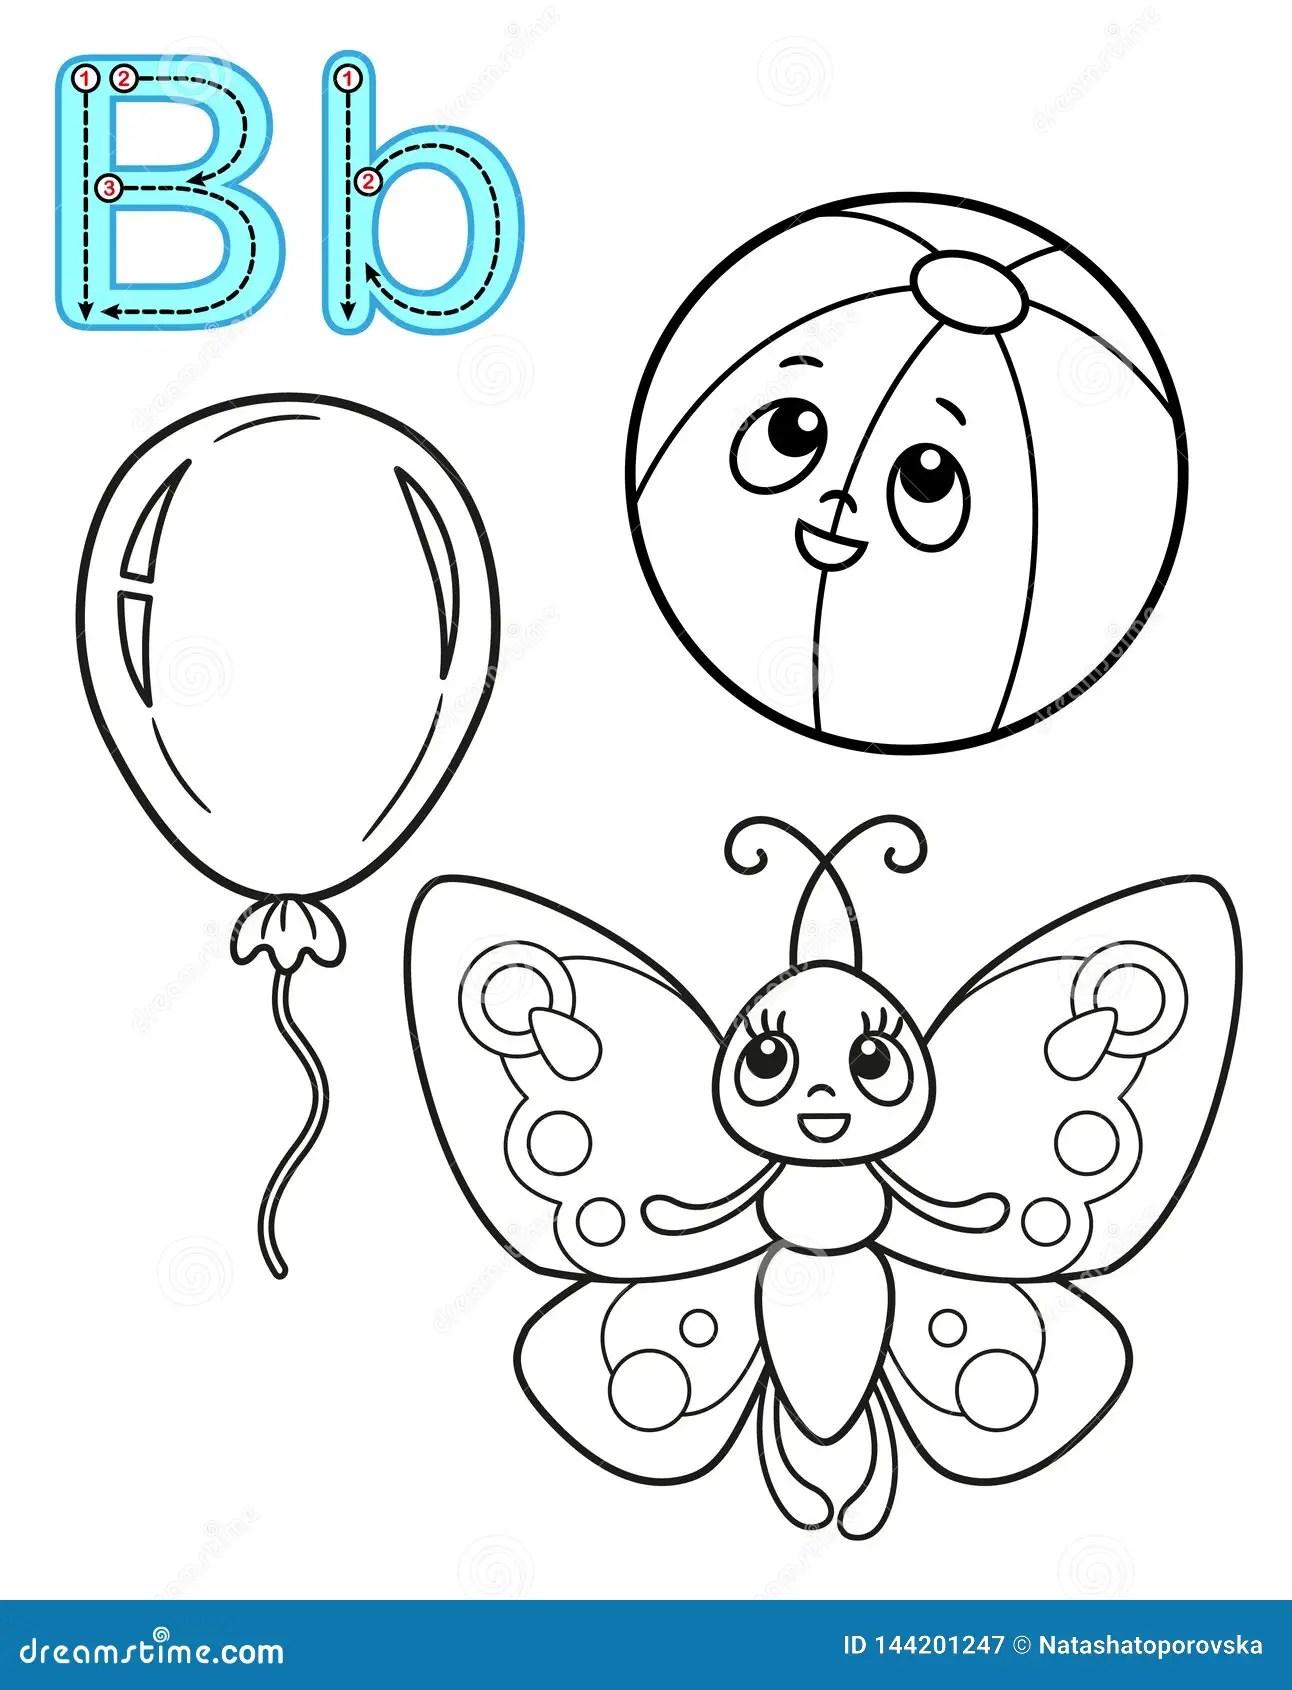 B For Butterfly Worksheet